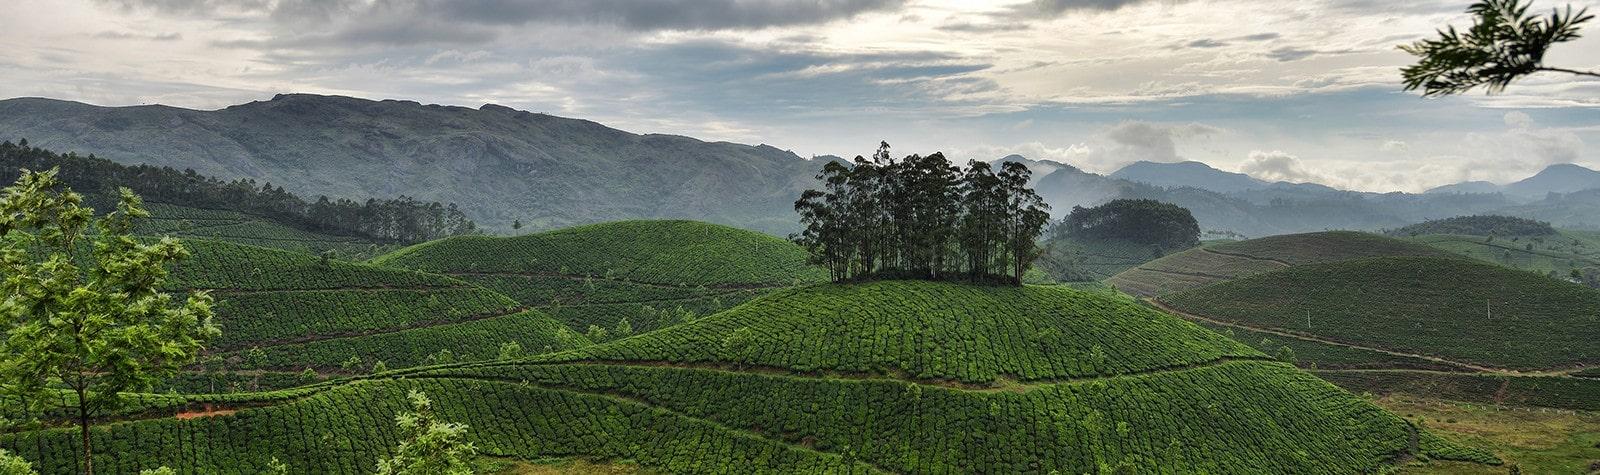 Китайская плантация чая